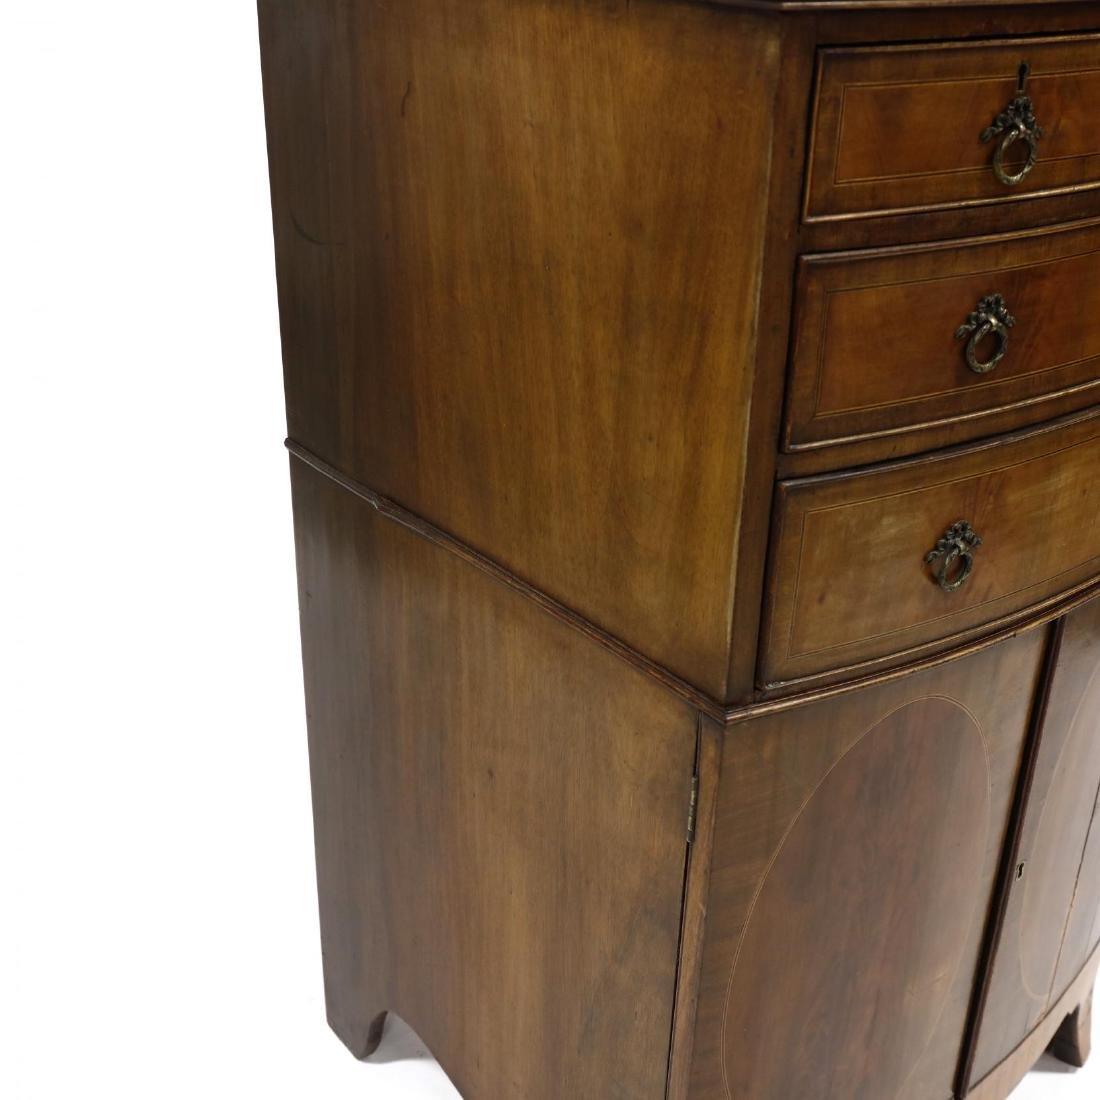 George III Mahogany Inlaid Dressing Cabinet - 2